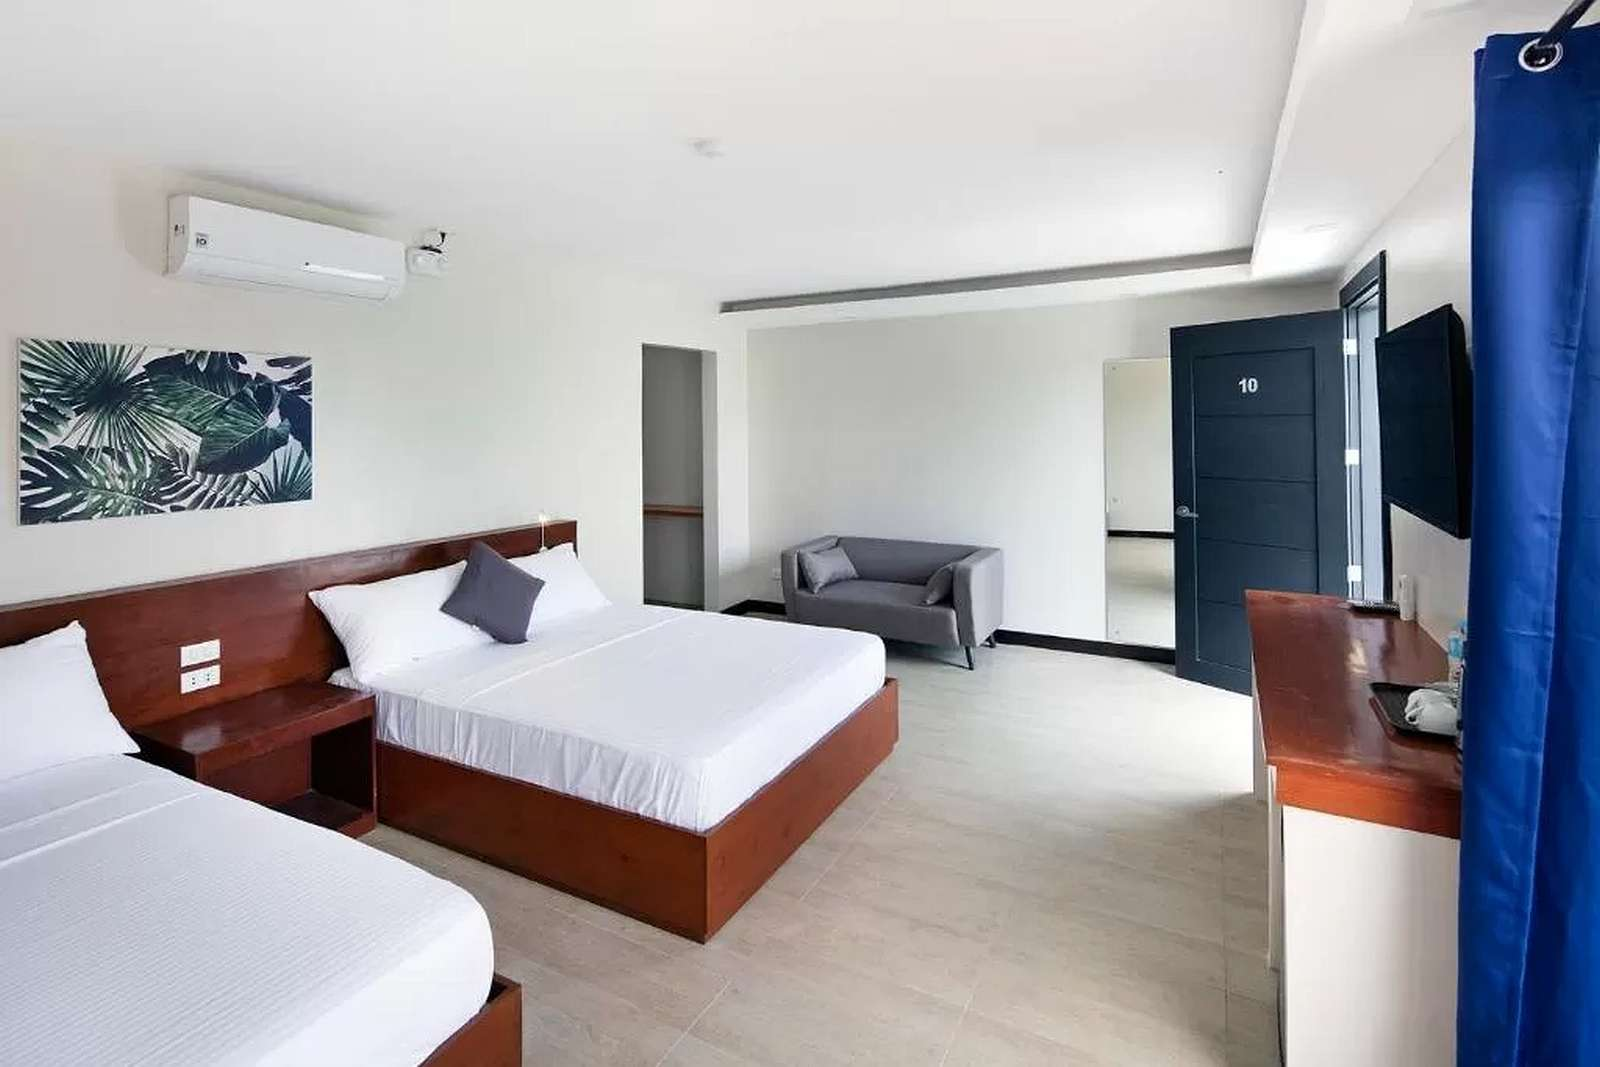 Ohana panglao resort bohol book here for discount rates (9)